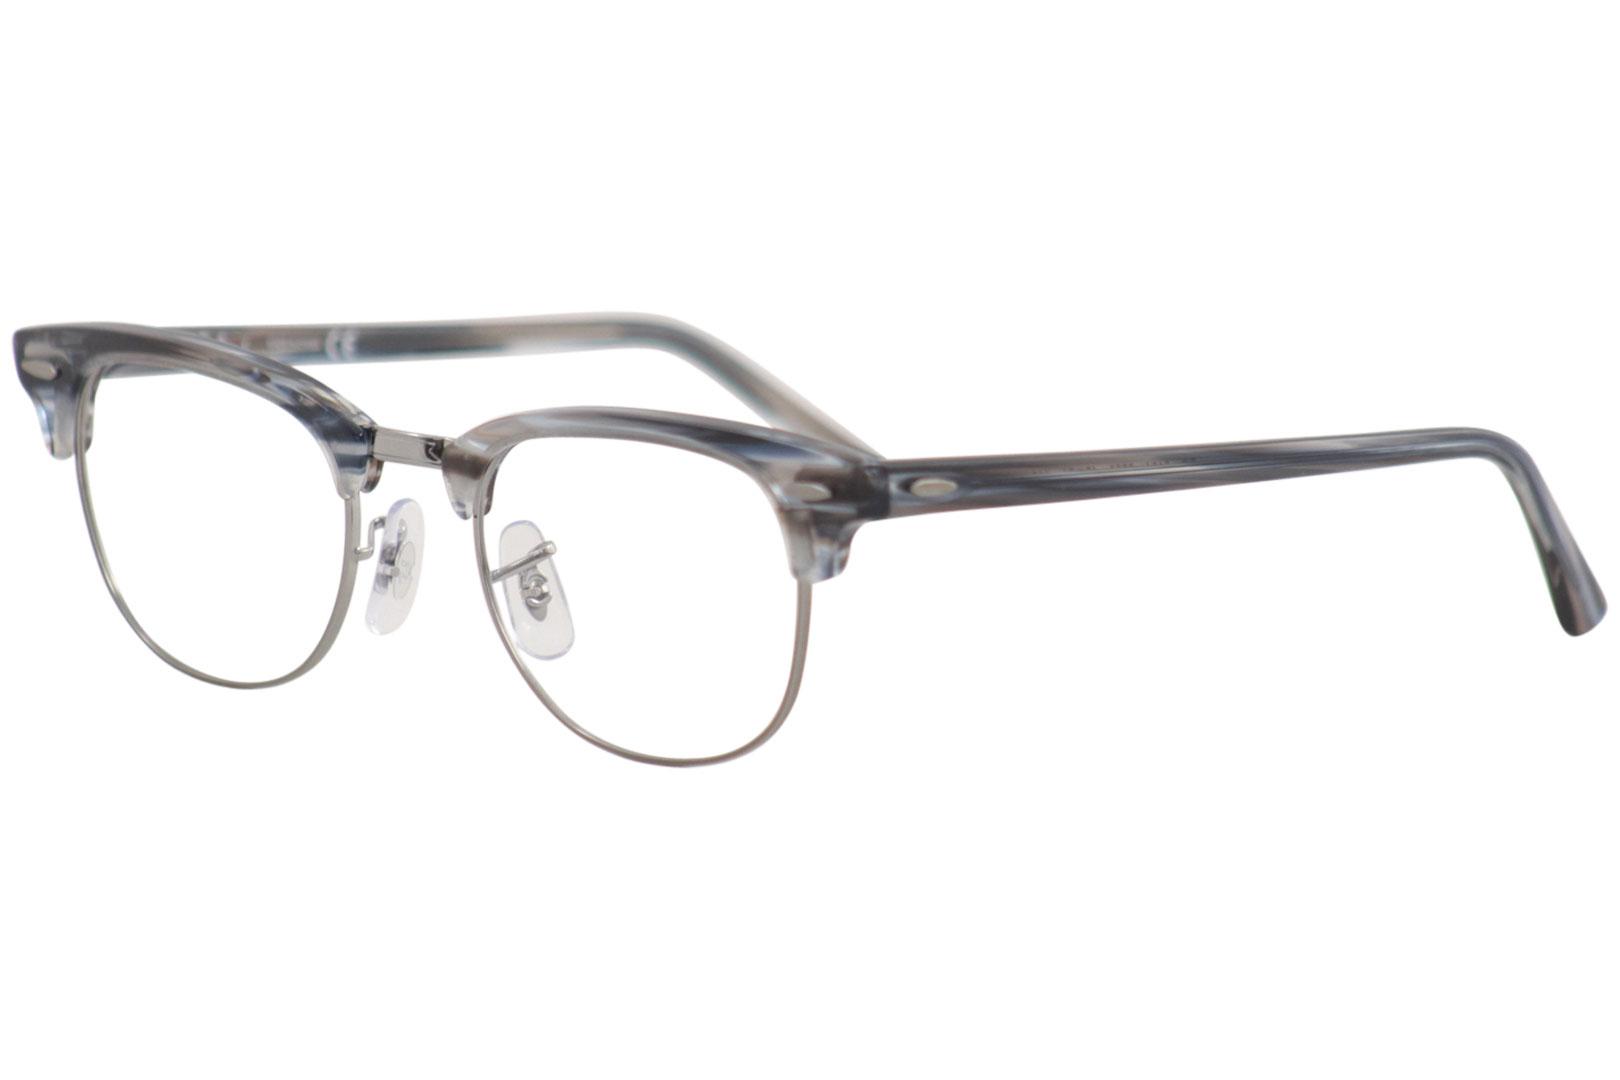 9a29e2fafb Ray Ban Eyeglasses Clubmaster RB5154 RX 5154 5750 Blue RayBan ...